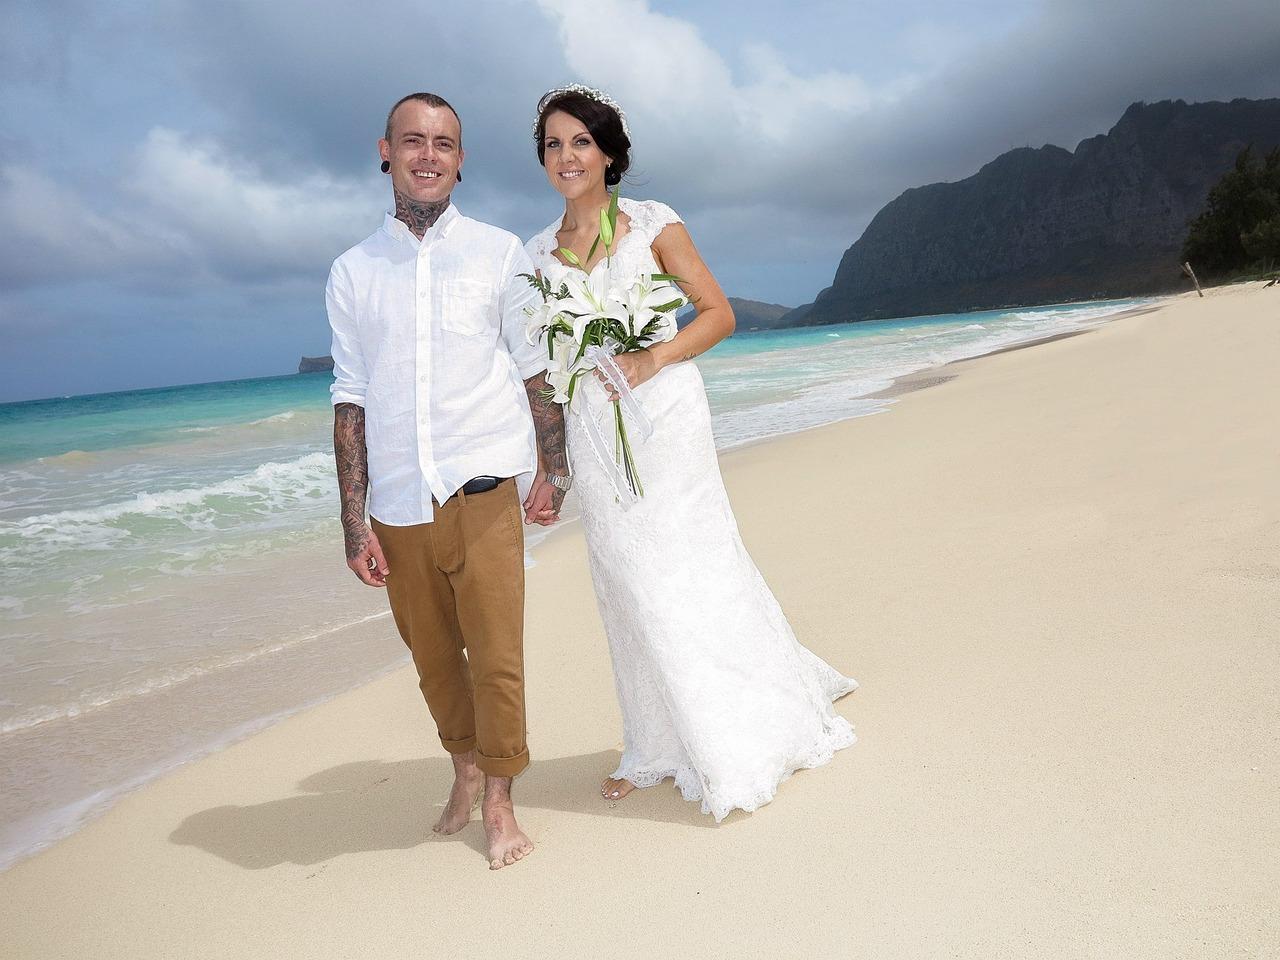 40s-wedding - Wedding and Evening Dresses